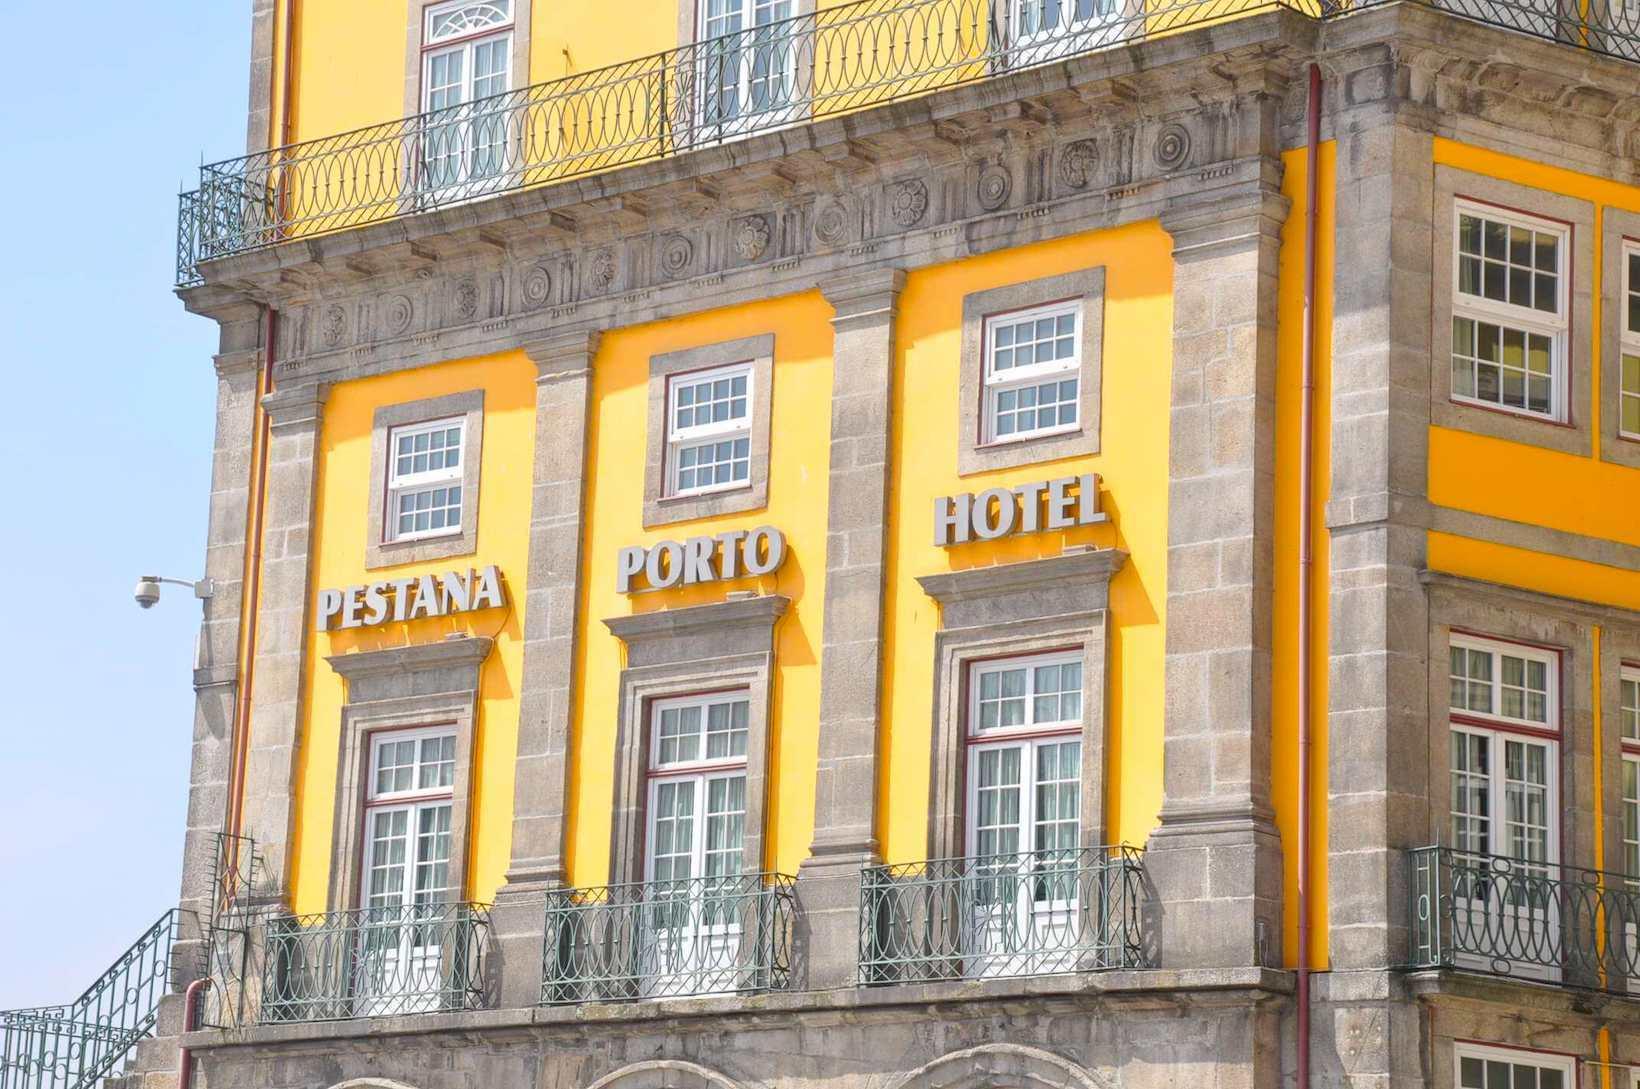 onde ficar hotel porto portugal